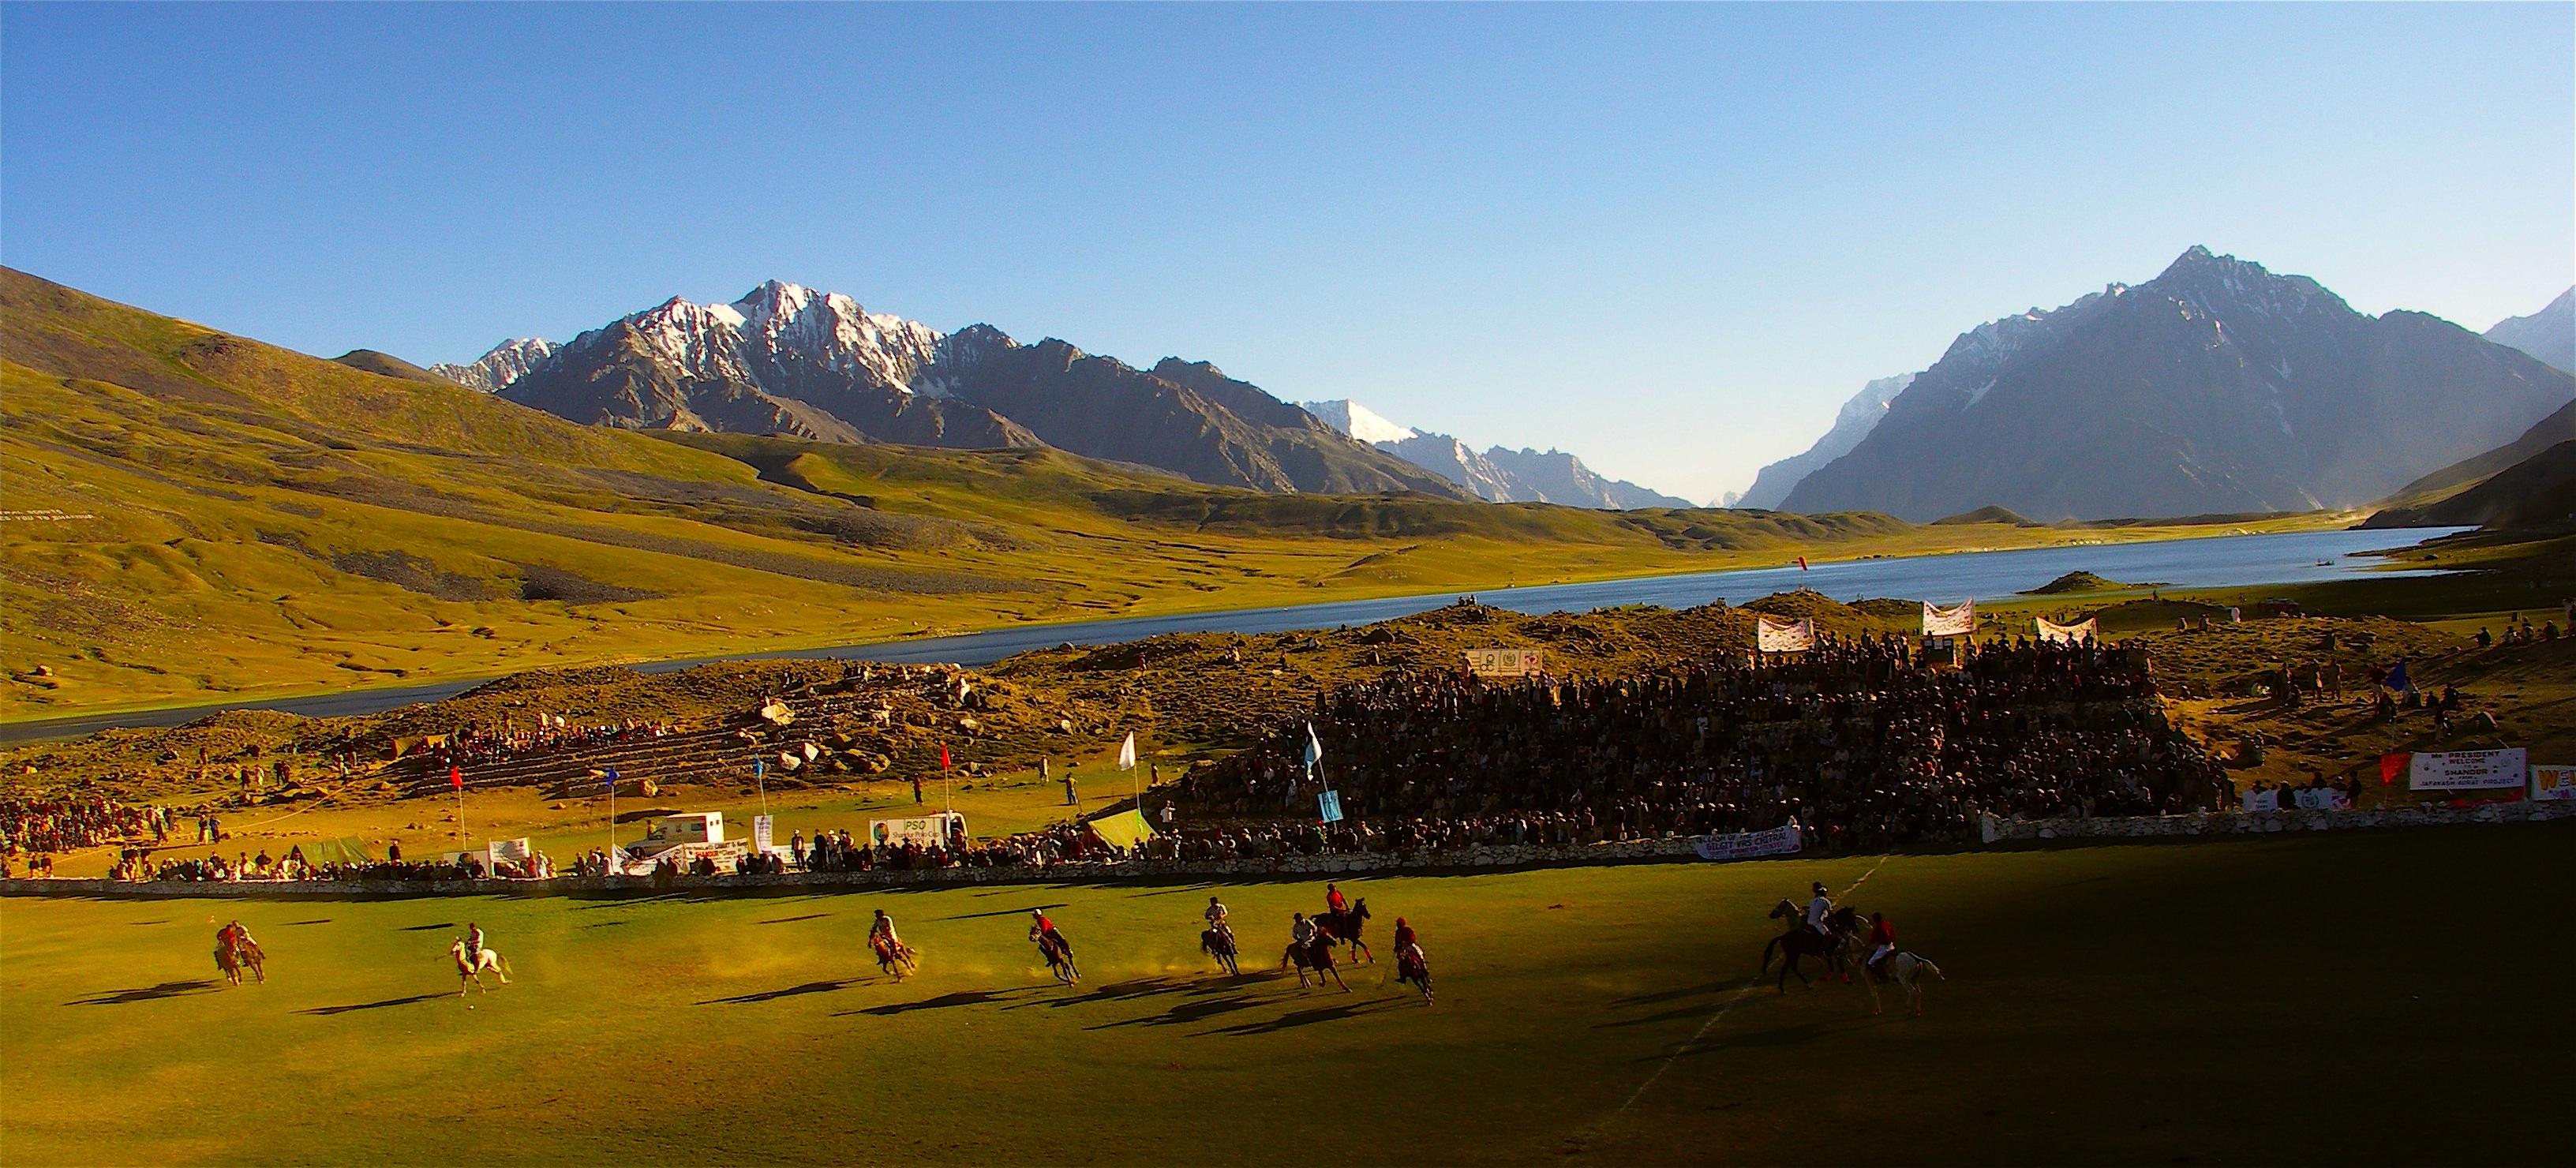 Shandur-Polo-Festival